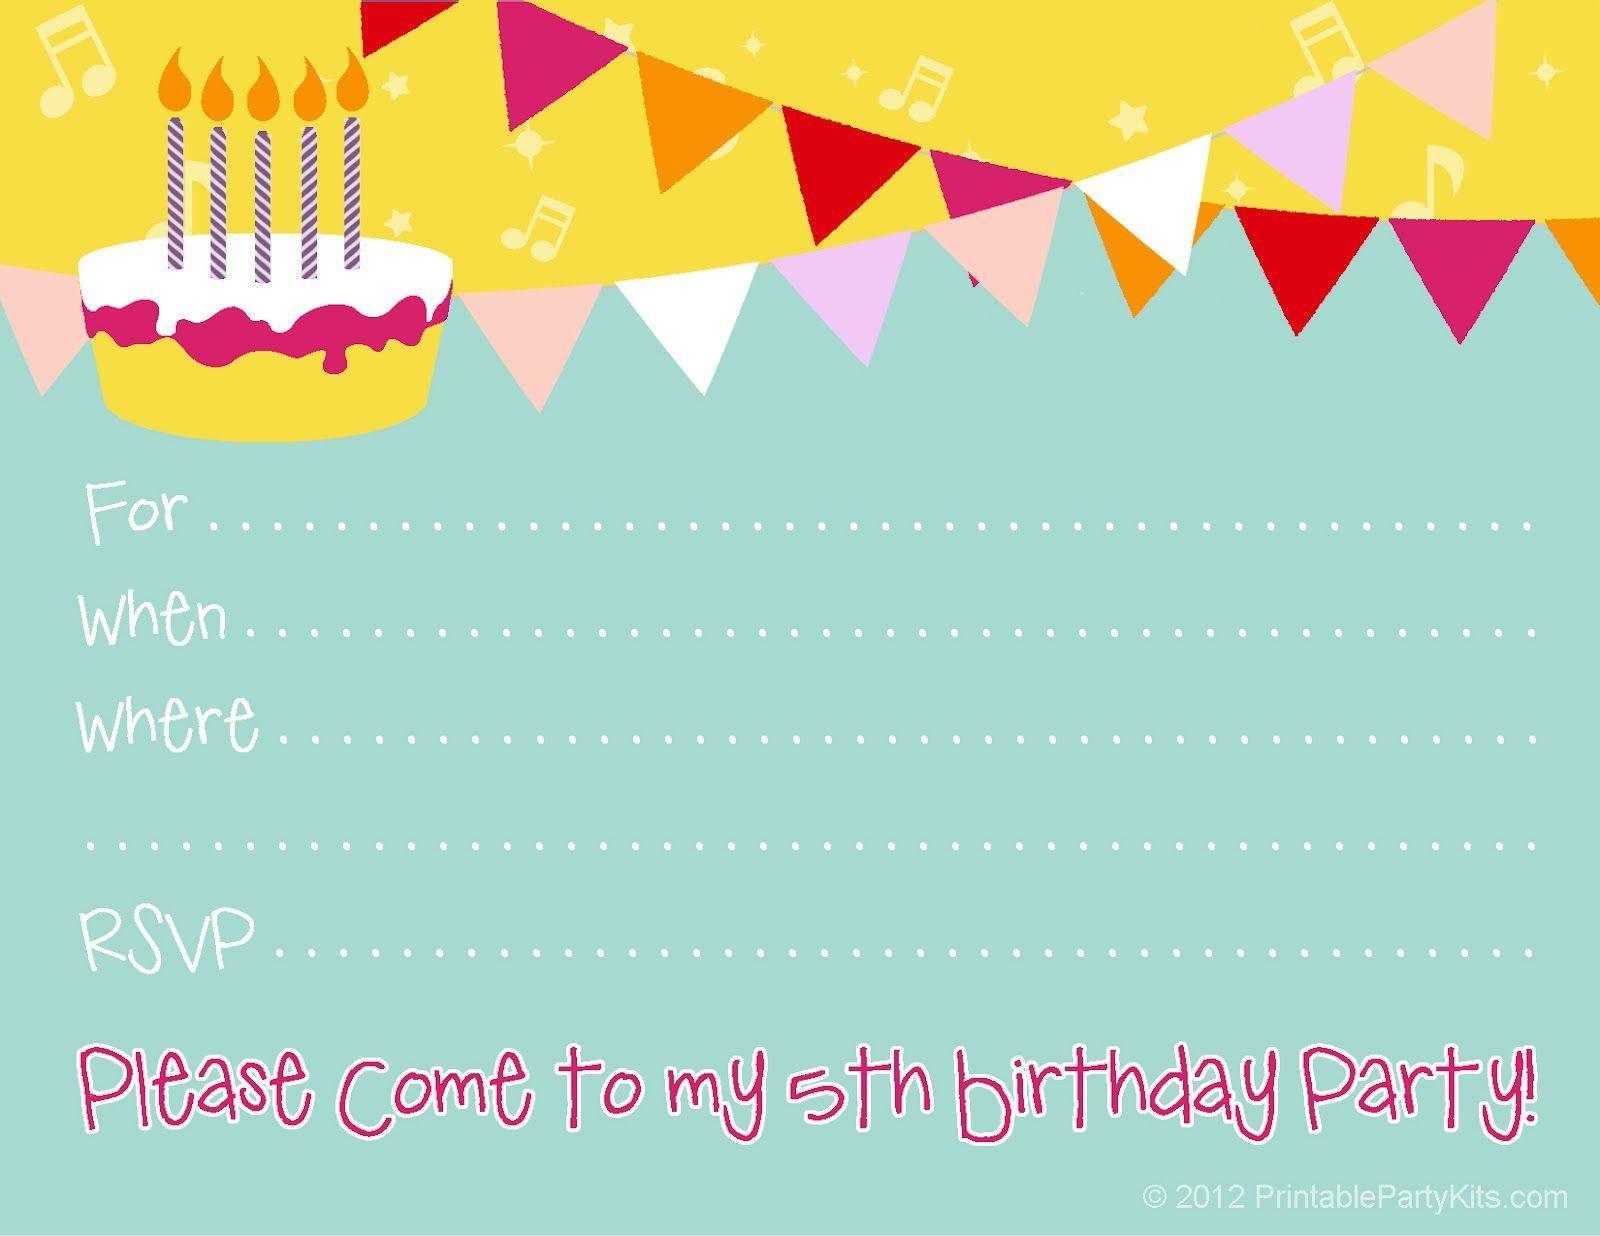 Birthday Invitation Template Birthday Invitation Card Template Free Download Birthday Invitation Template Birthday Invitat Blogging Tips Blogging Belajar